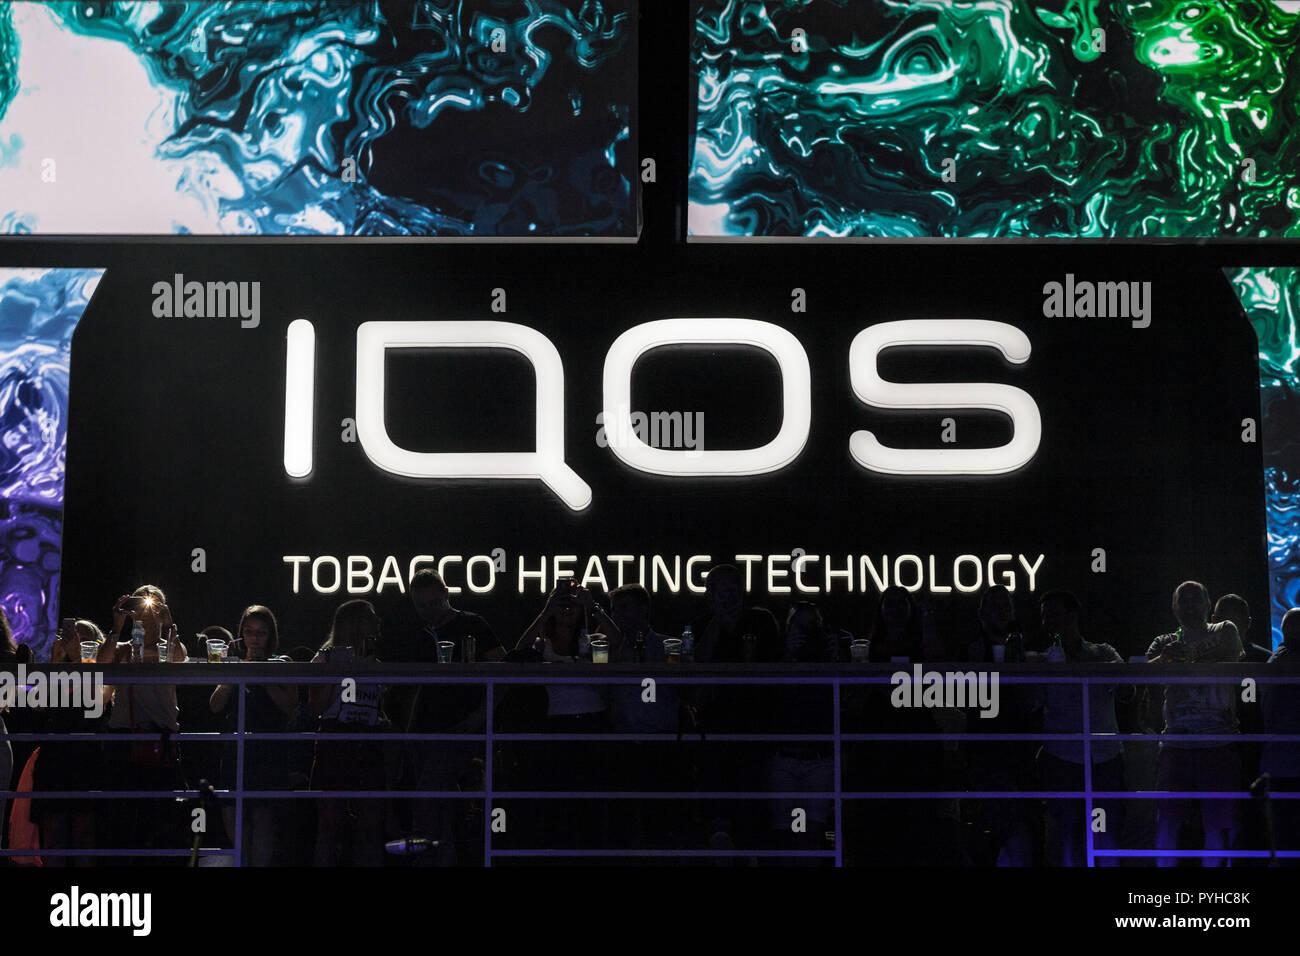 Tobacco Brand Stock Photos & Tobacco Brand Stock Images - Alamy